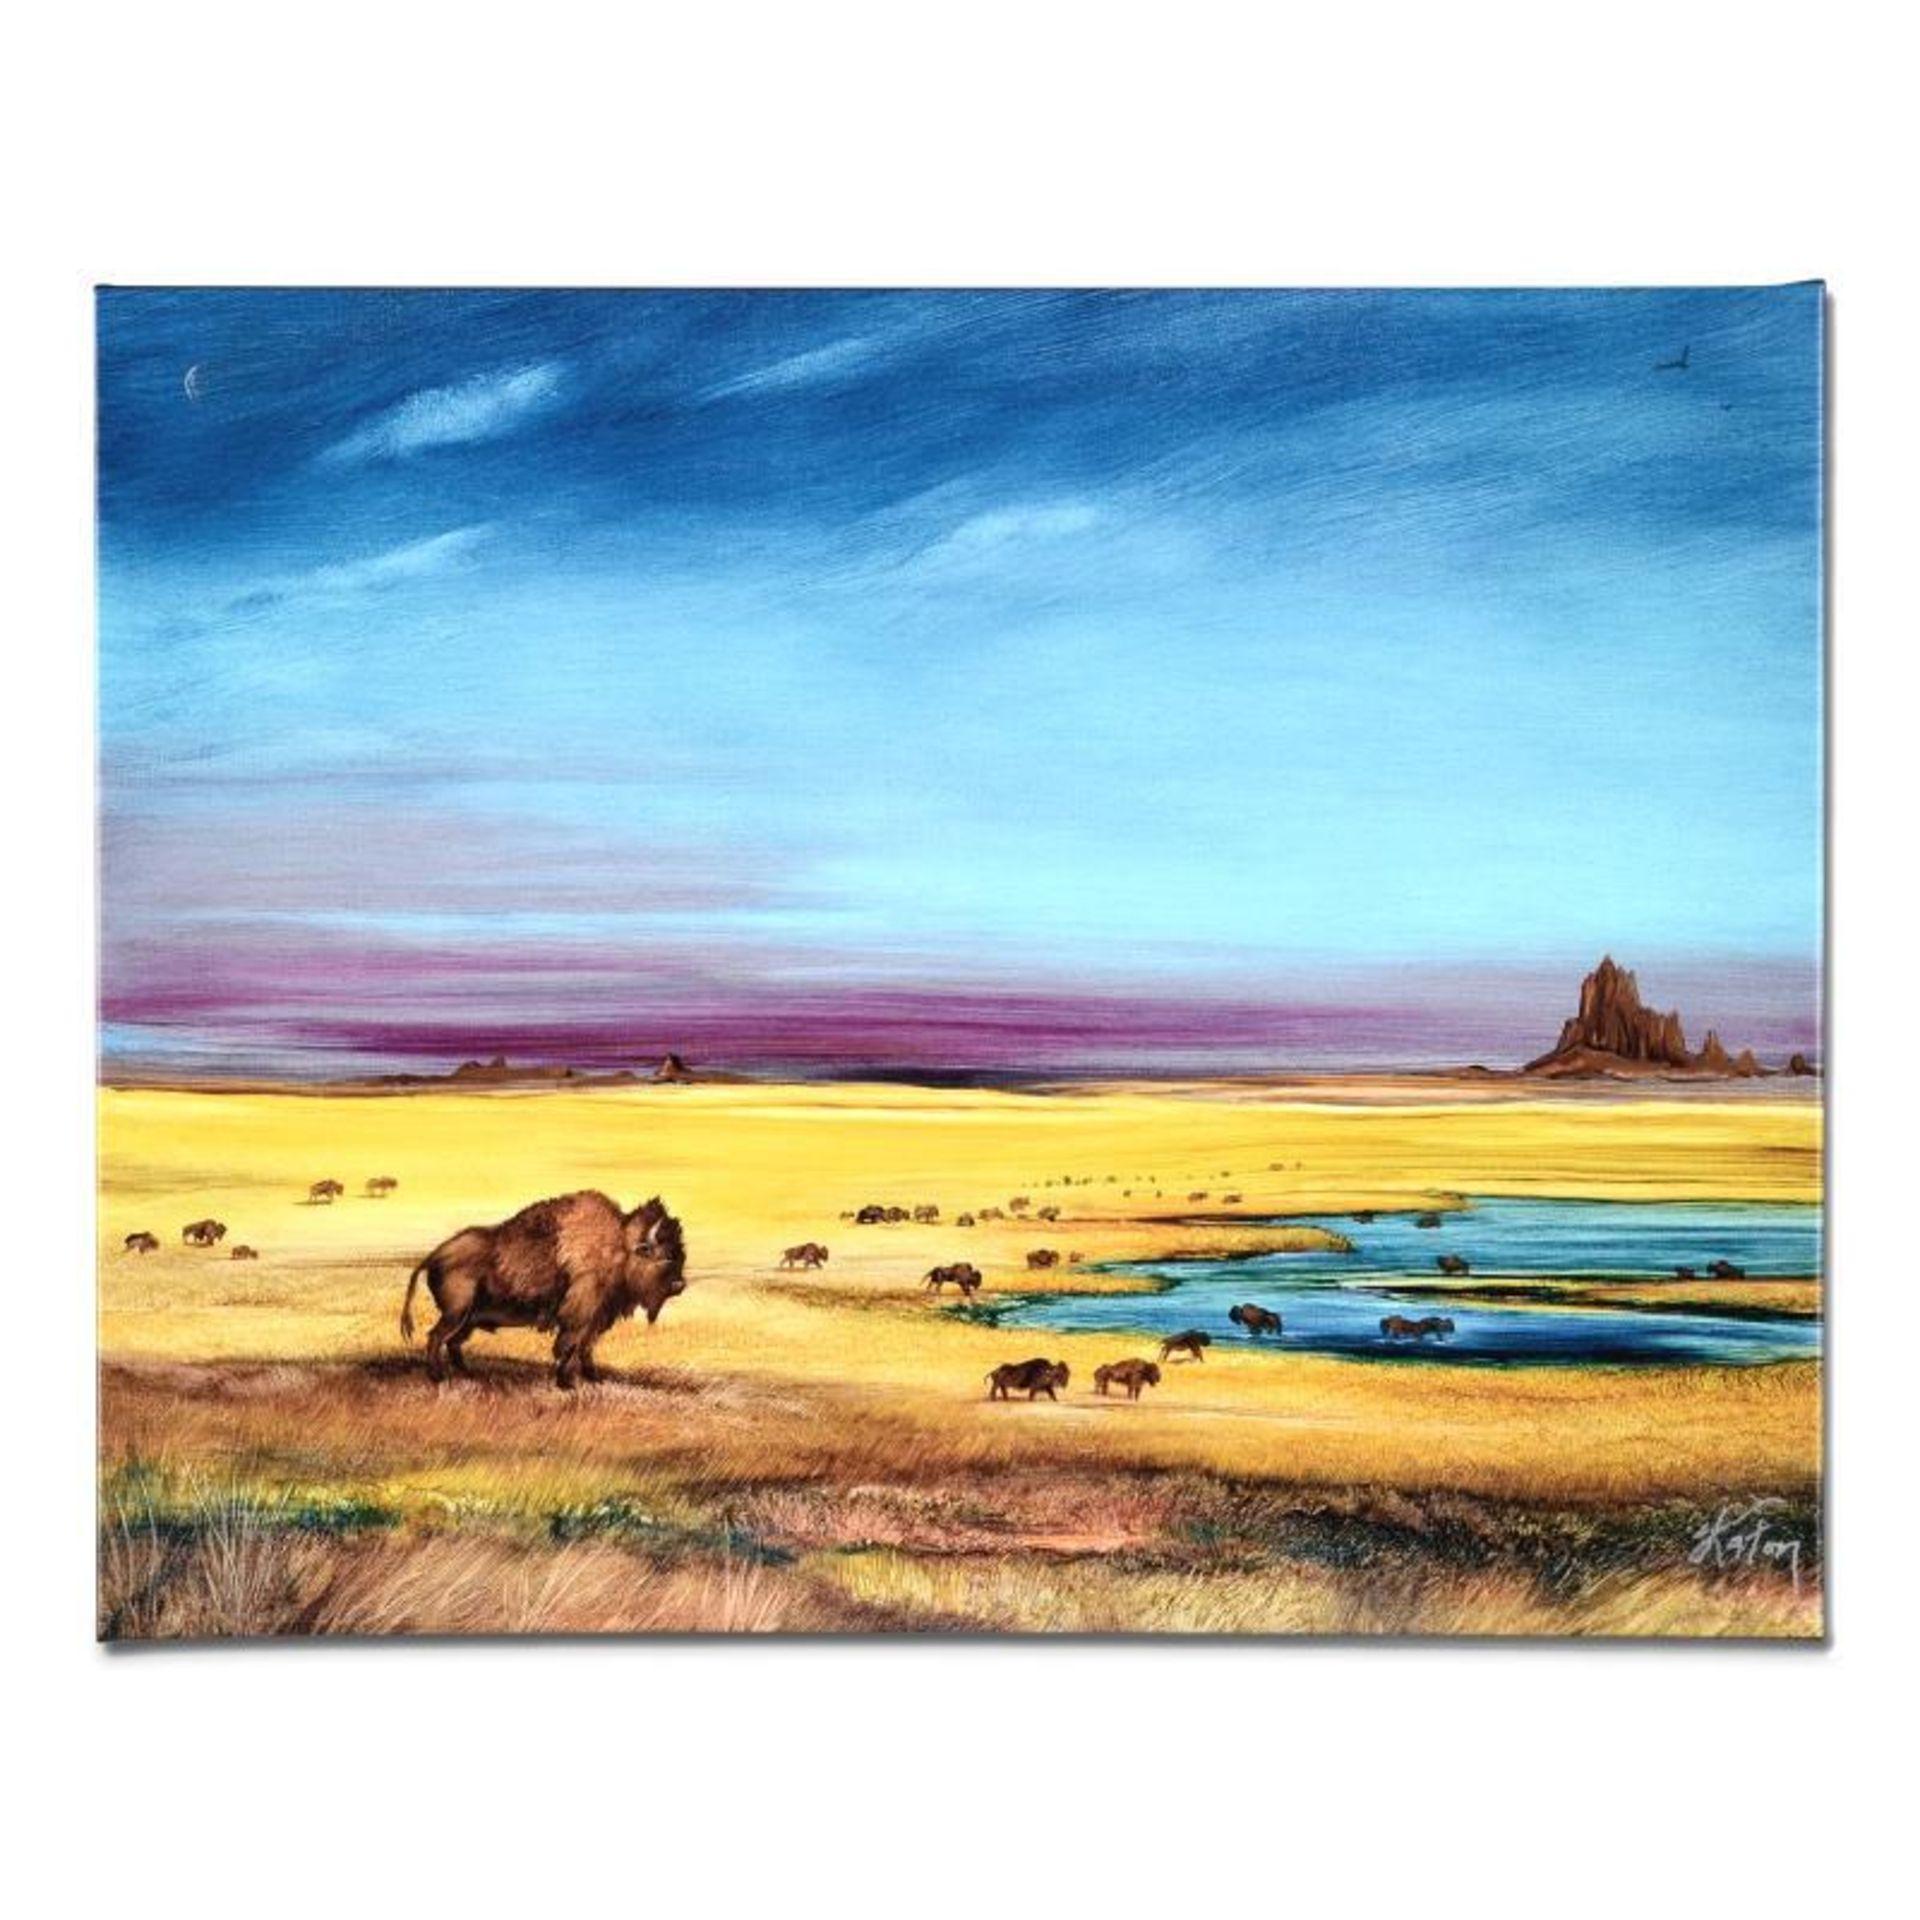 Where the Buffalo by Katon, Martin - Image 2 of 4